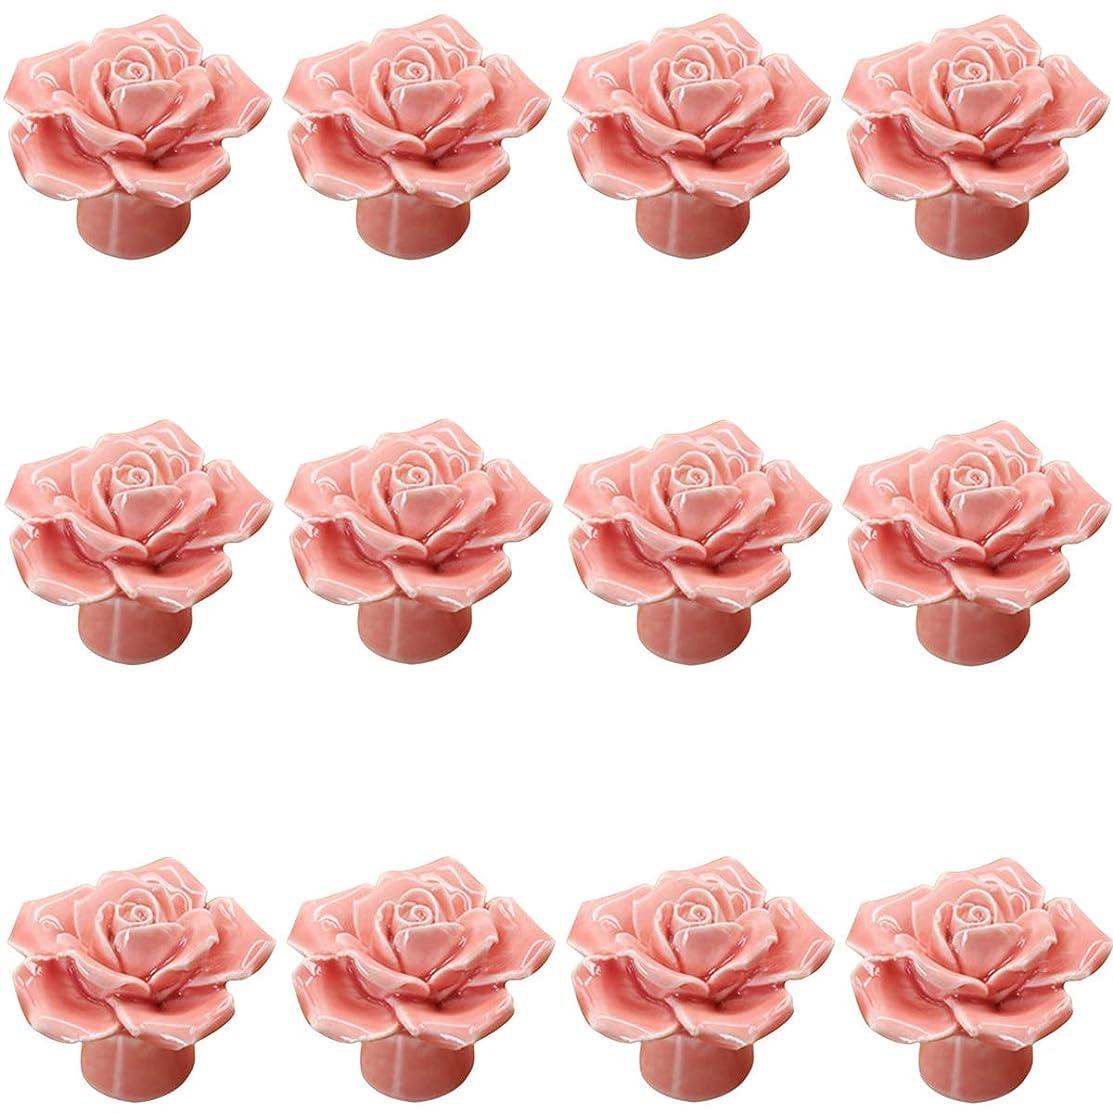 Pink Ceramic Rose Flower Knob ?European Modern Handle for Drawer Dresser Door Cabinet Cupboard Children's Furniture Home Decoration by Choubao-12PCS